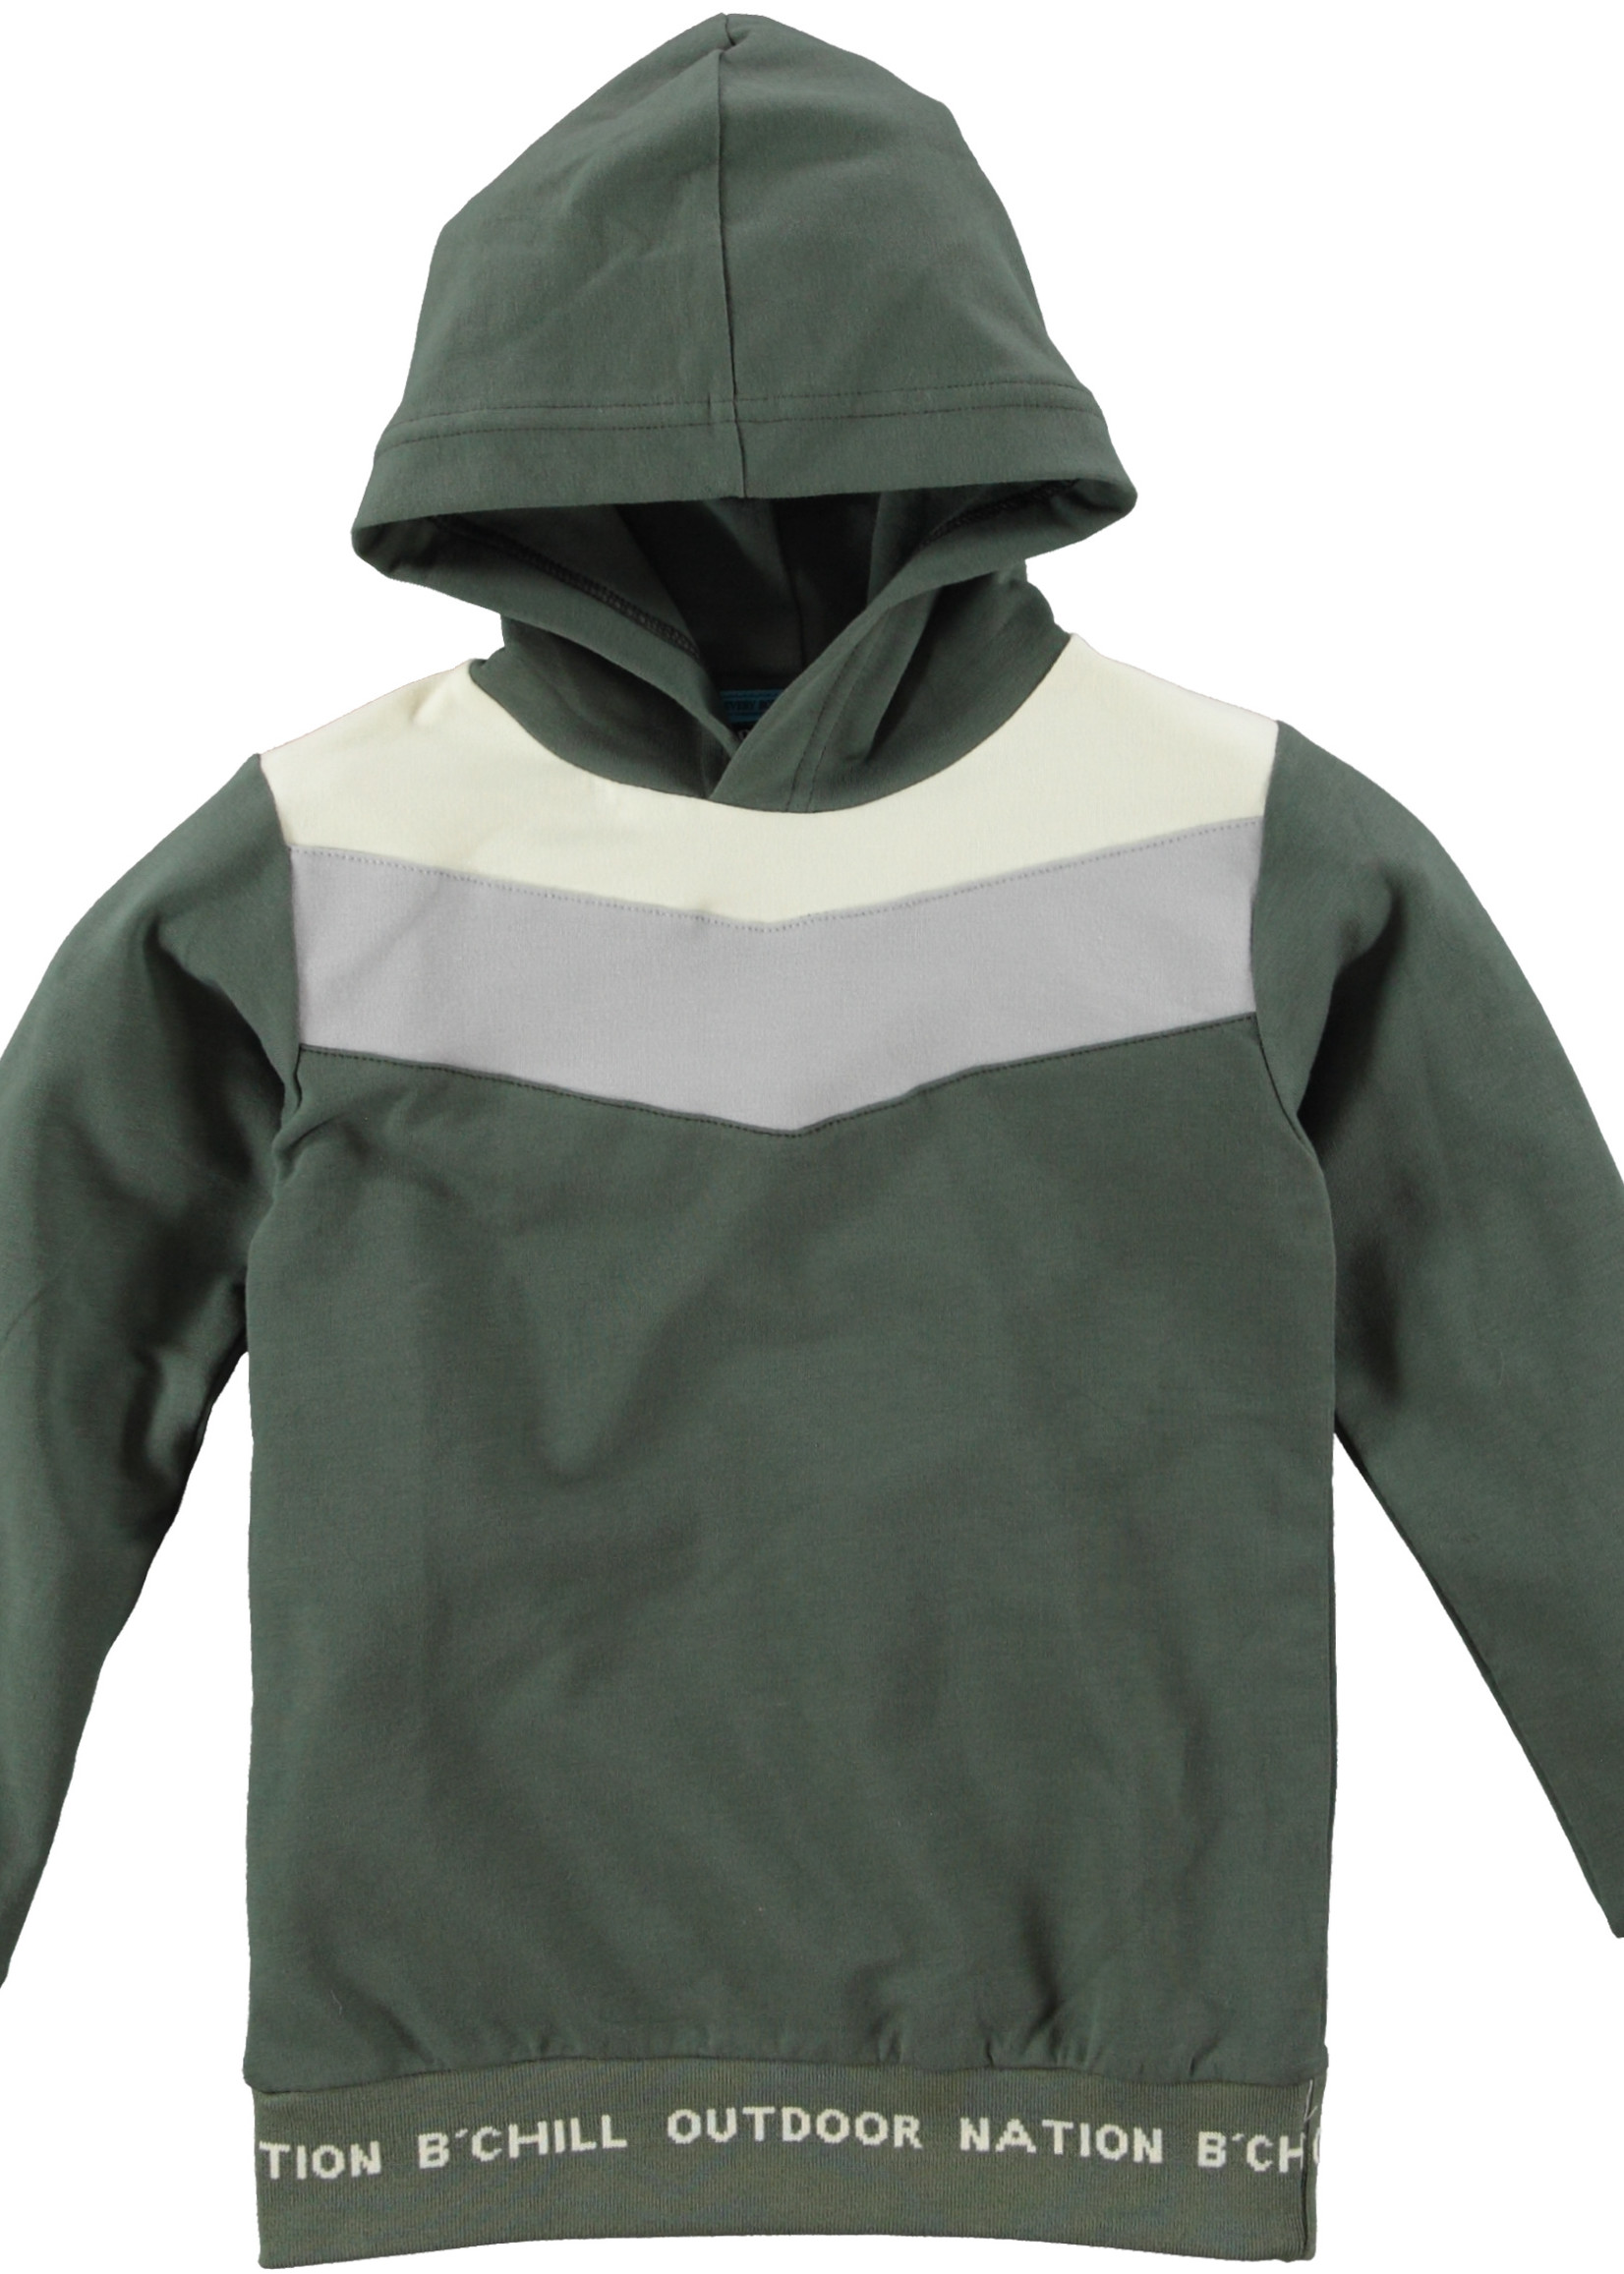 B'chill Giel hoodie